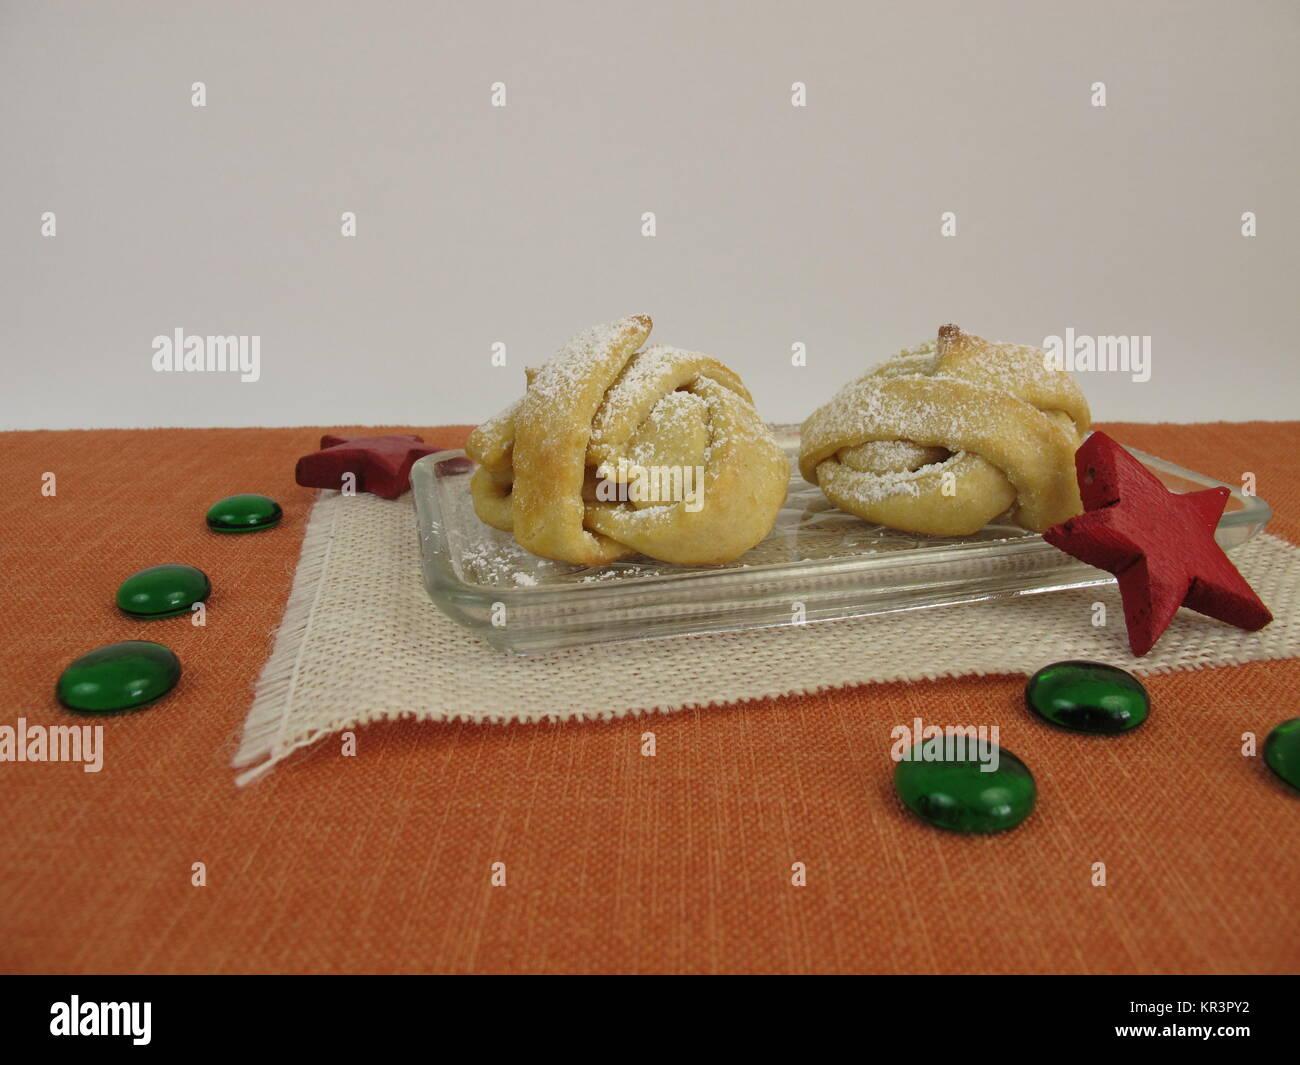 Schneebälle Mürbeteig gebacken wie Weihnachten cookies Stockfoto ...